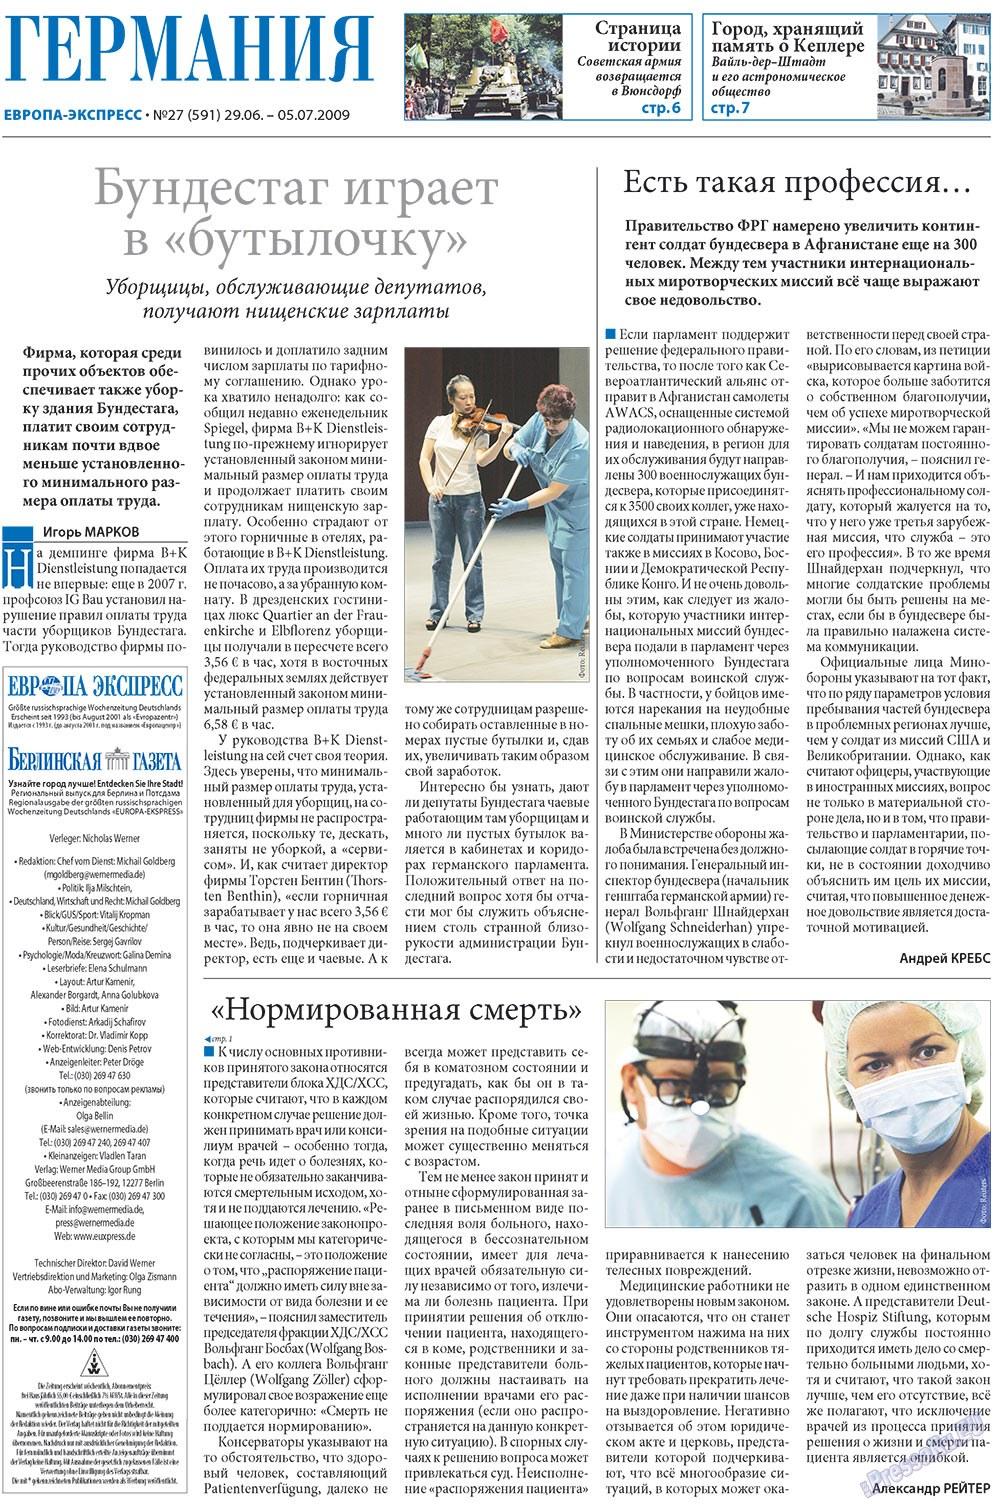 Европа экспресс (газета). 2009 год, номер 27, стр. 2